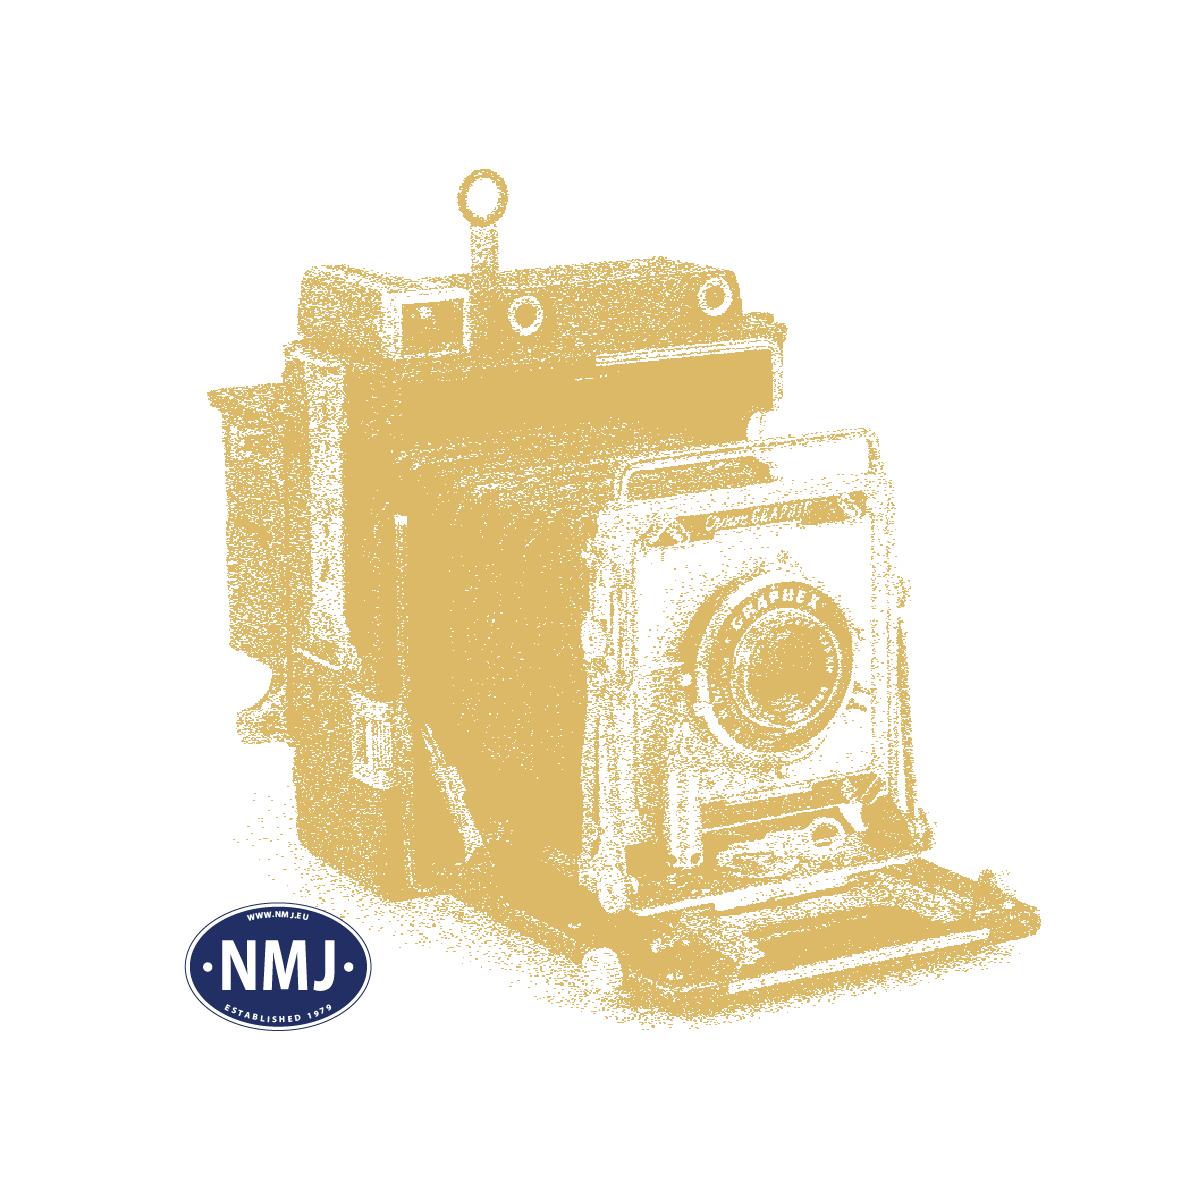 NMJT609.201 - NMJ Topline SJ Gbs 150 3 985-8